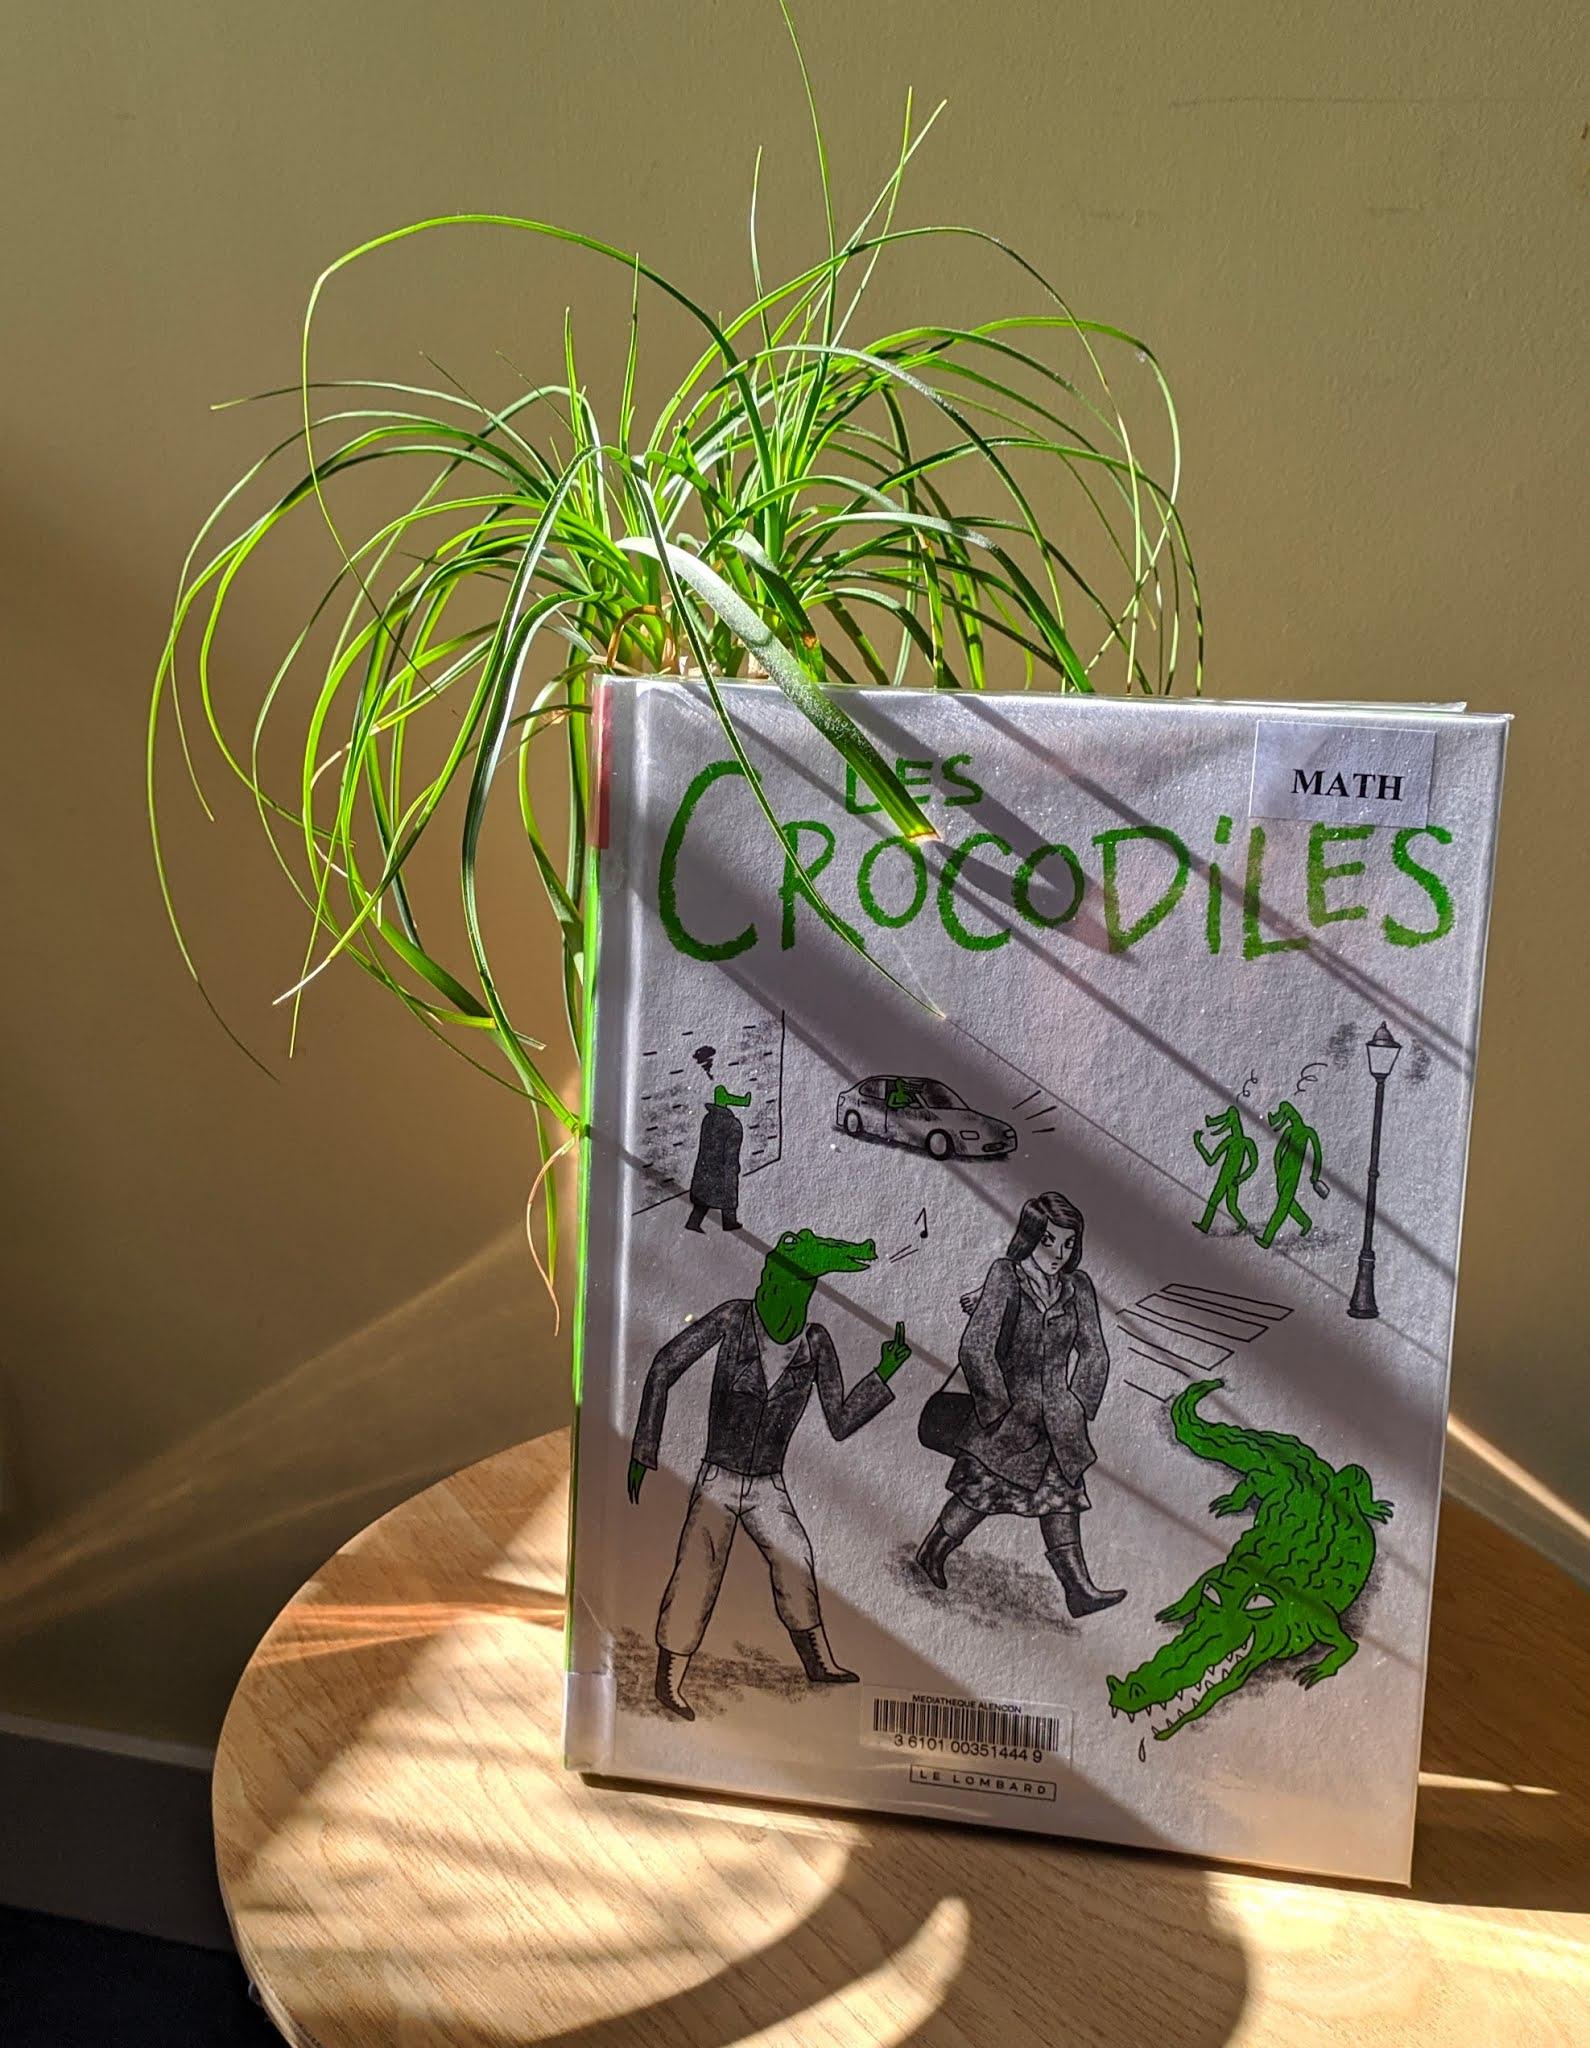 les-crocodiles-thomas-mathieu